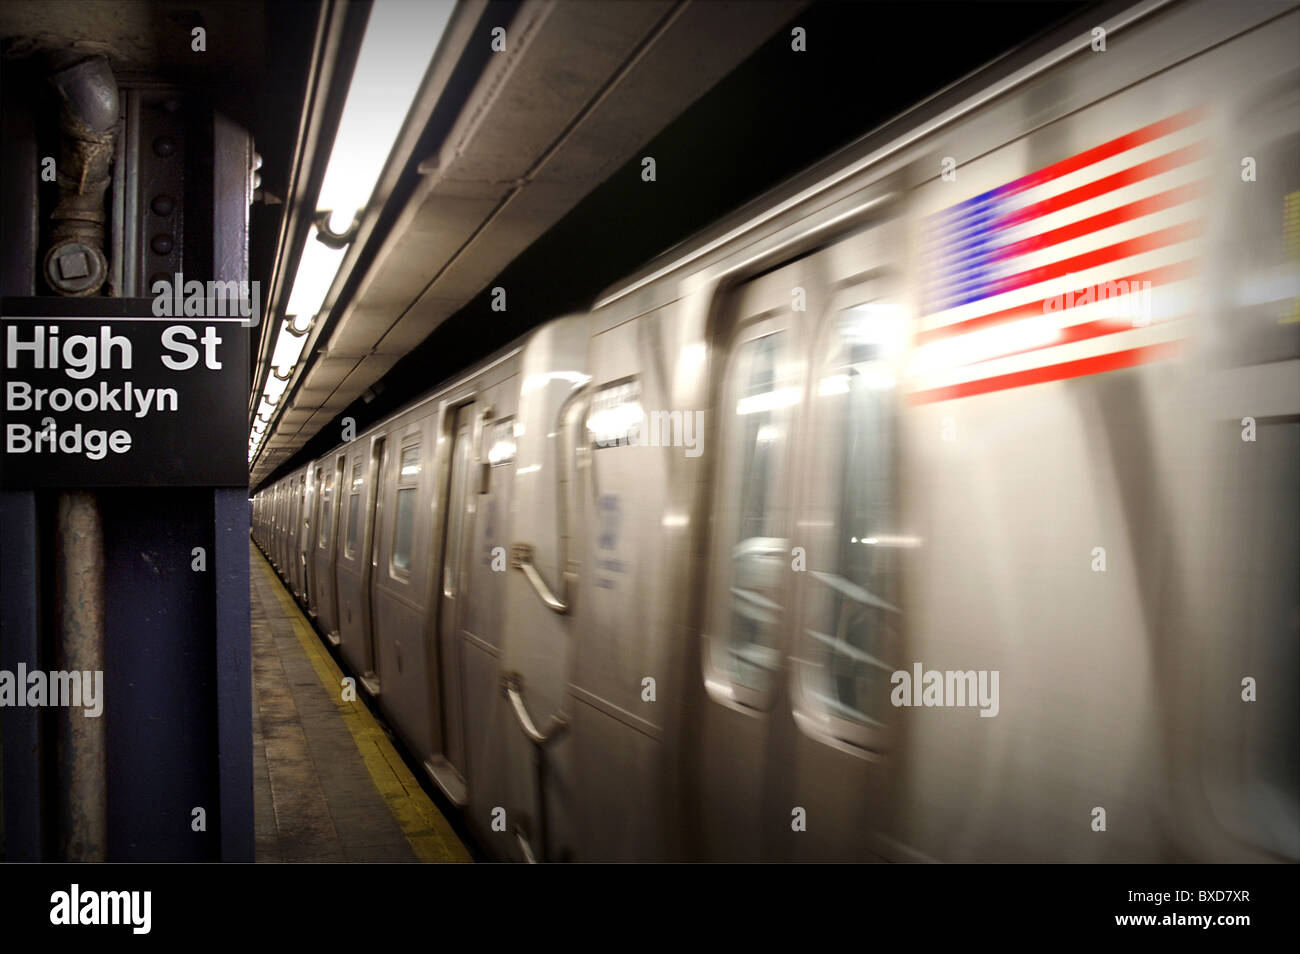 Brooklyn Bridge tube station, New York City - Stock Image